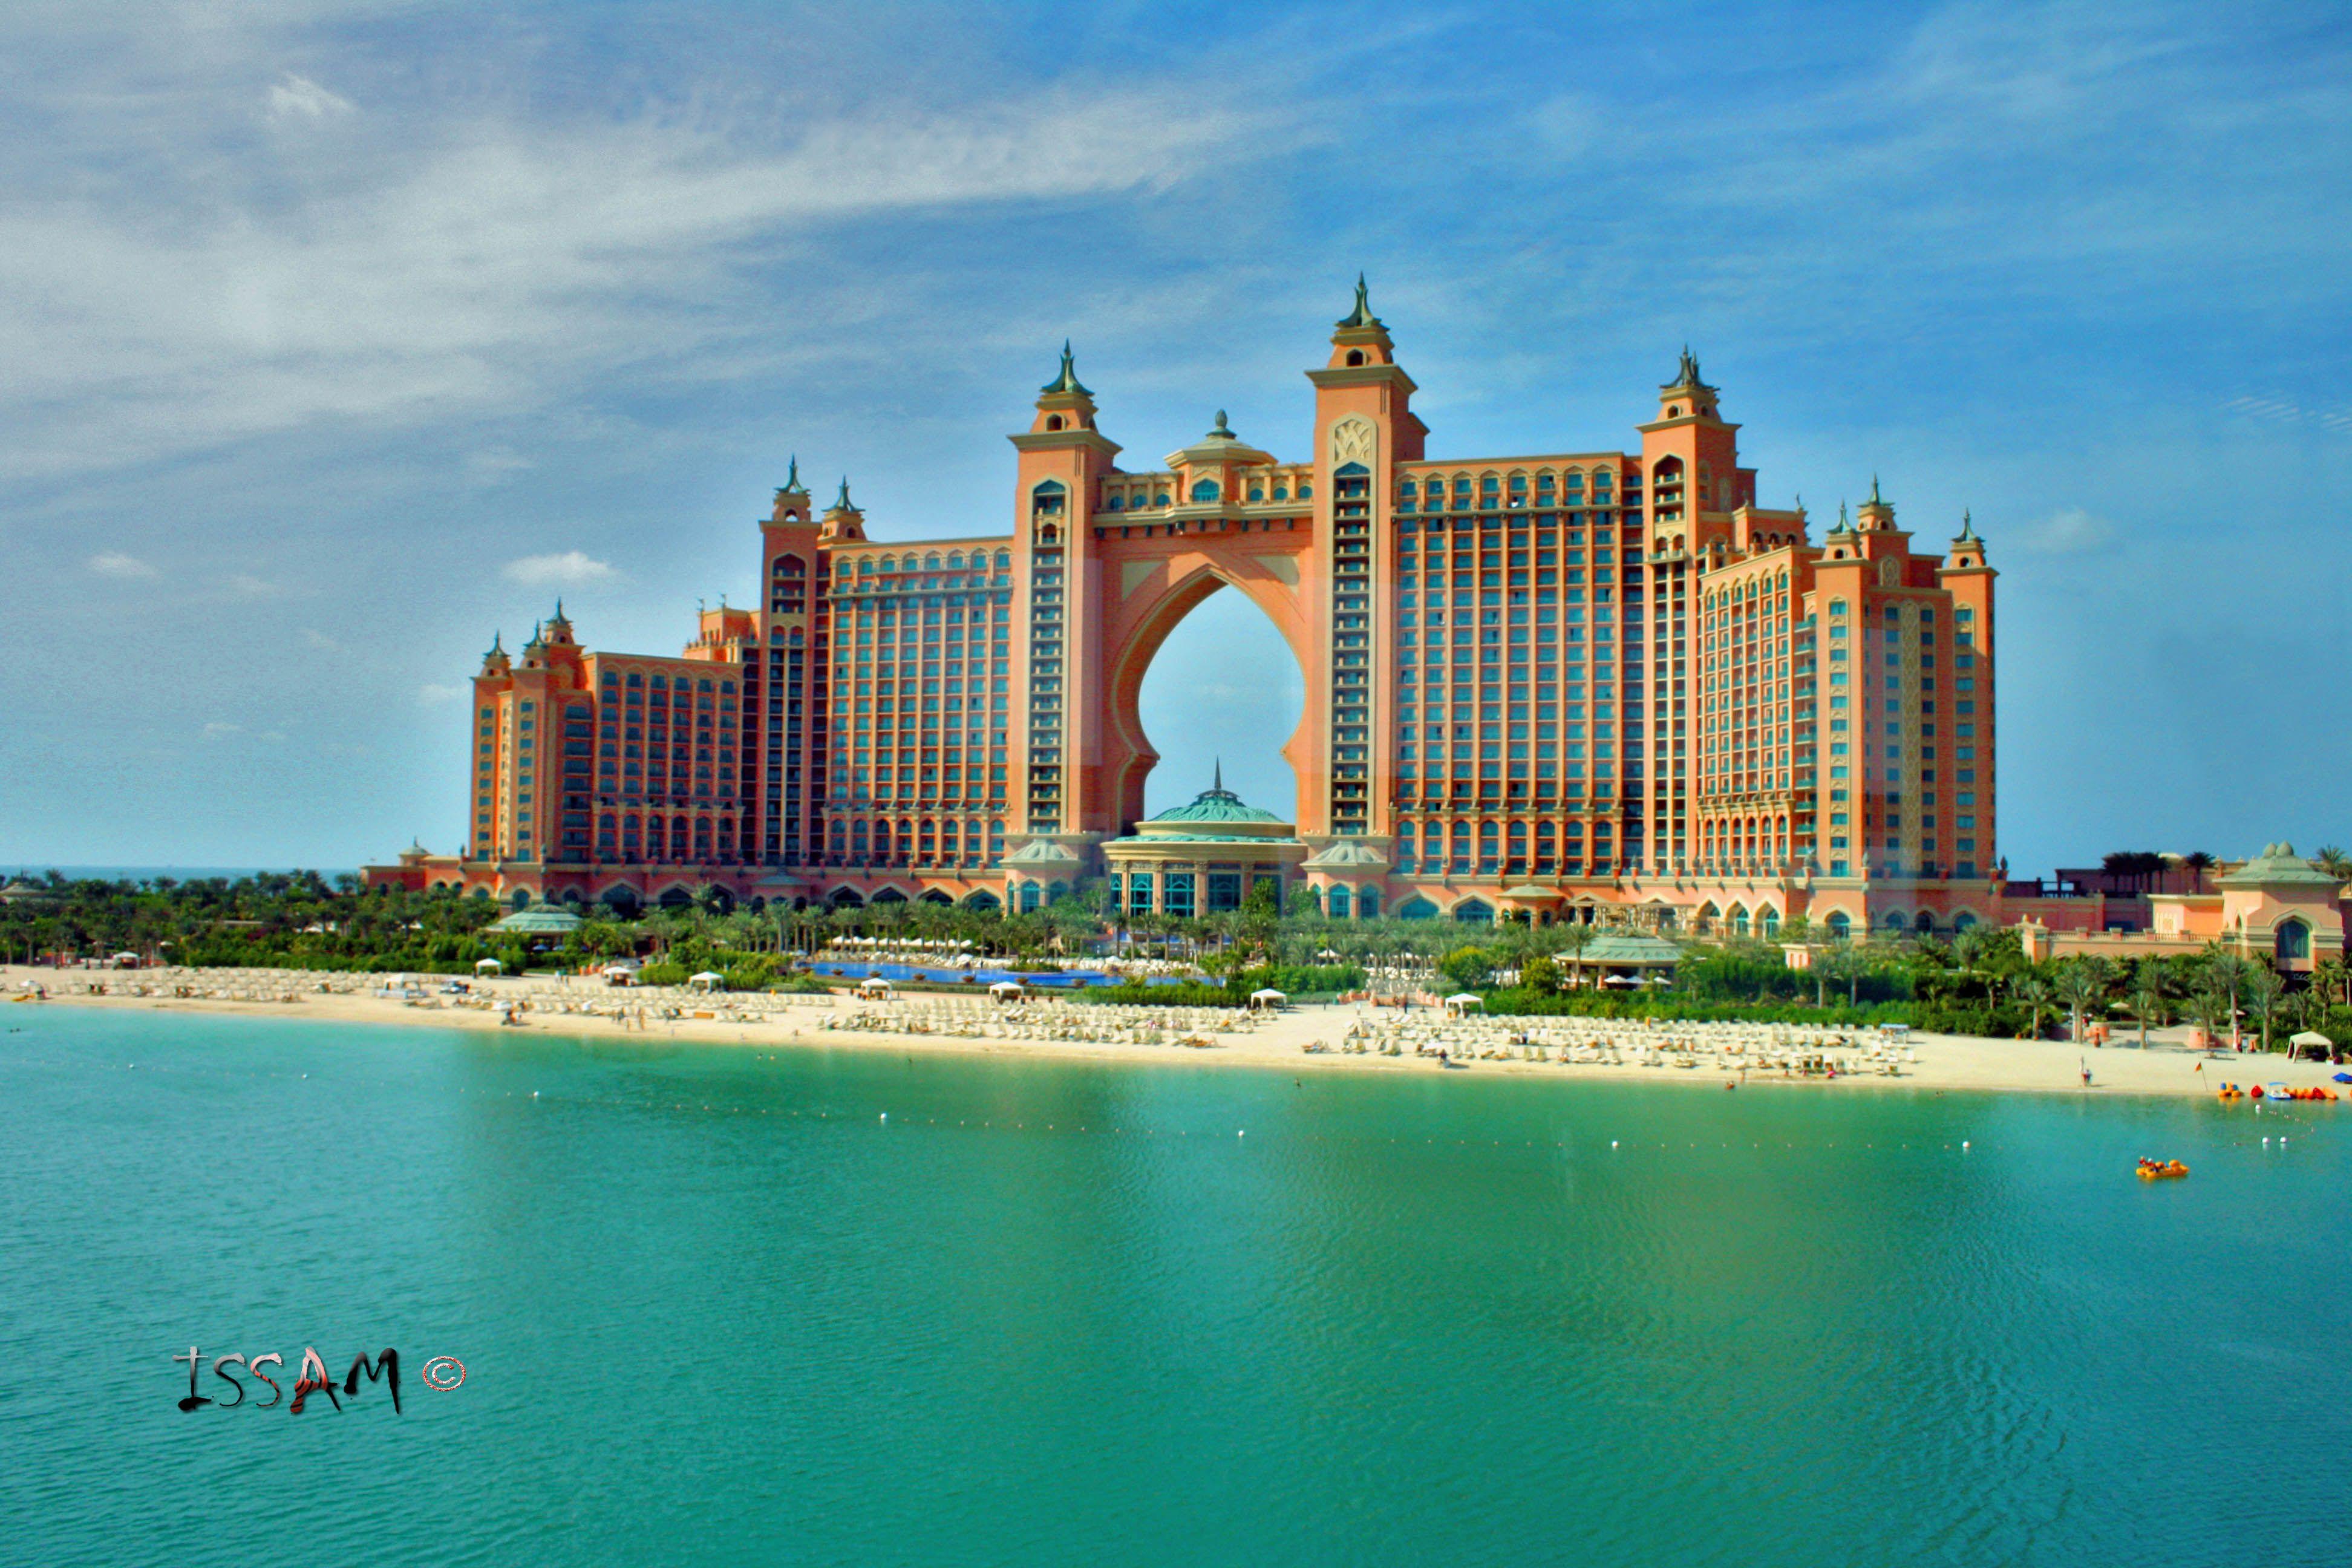 HD wallpaper Atlantis Hotel Dubai Desktop Wallpaper